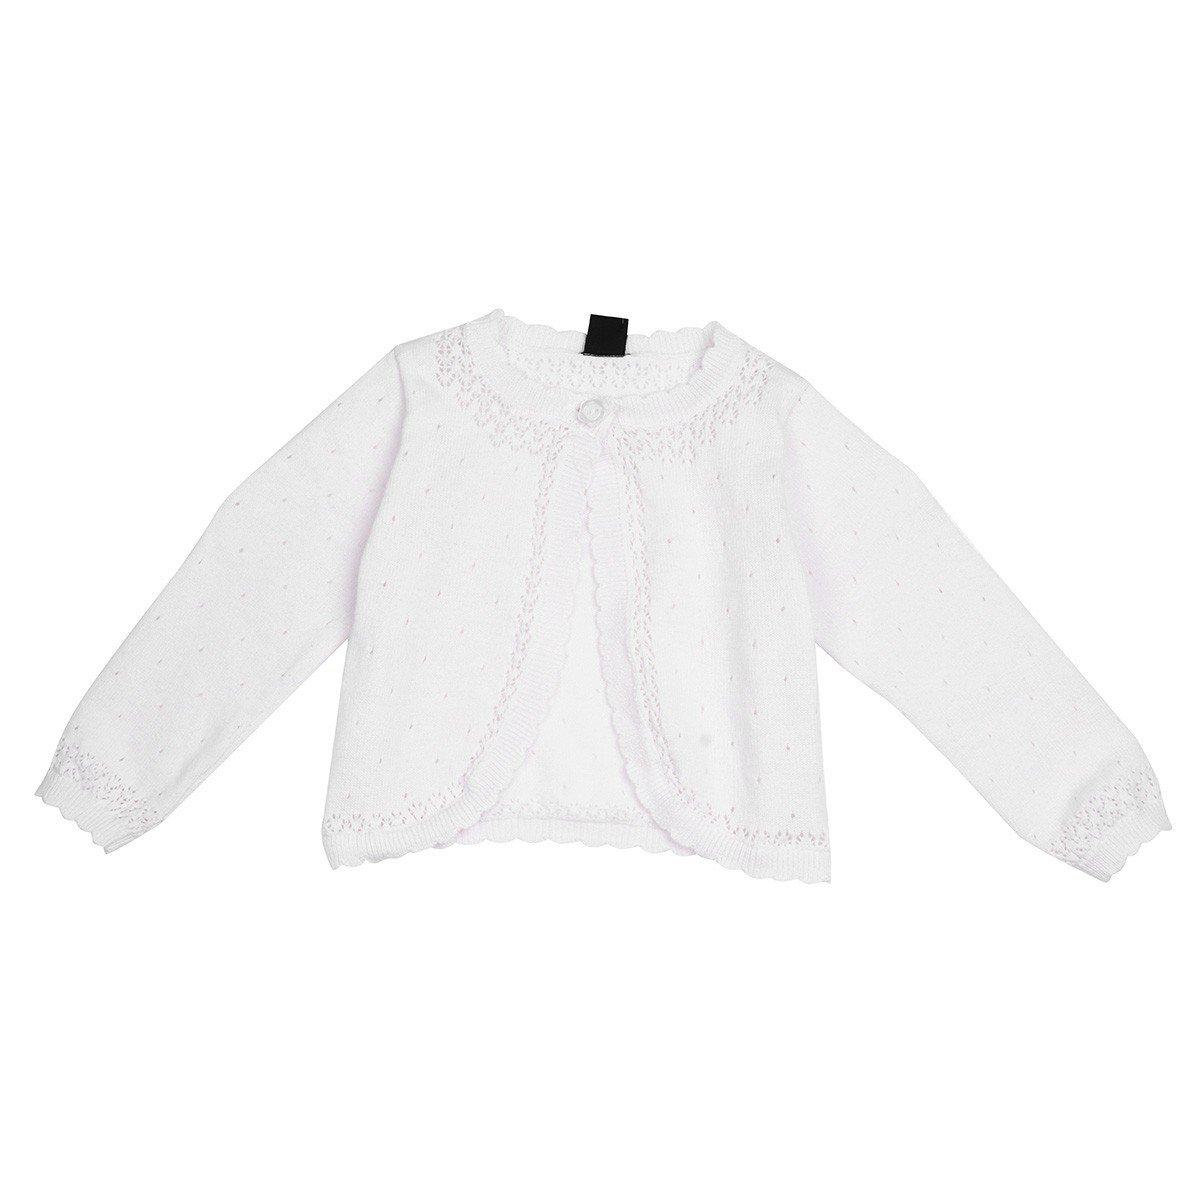 iiniim Kids Girls Long Sleeve Lace Flower Knit Bolero Shrug Cardigan Sweater